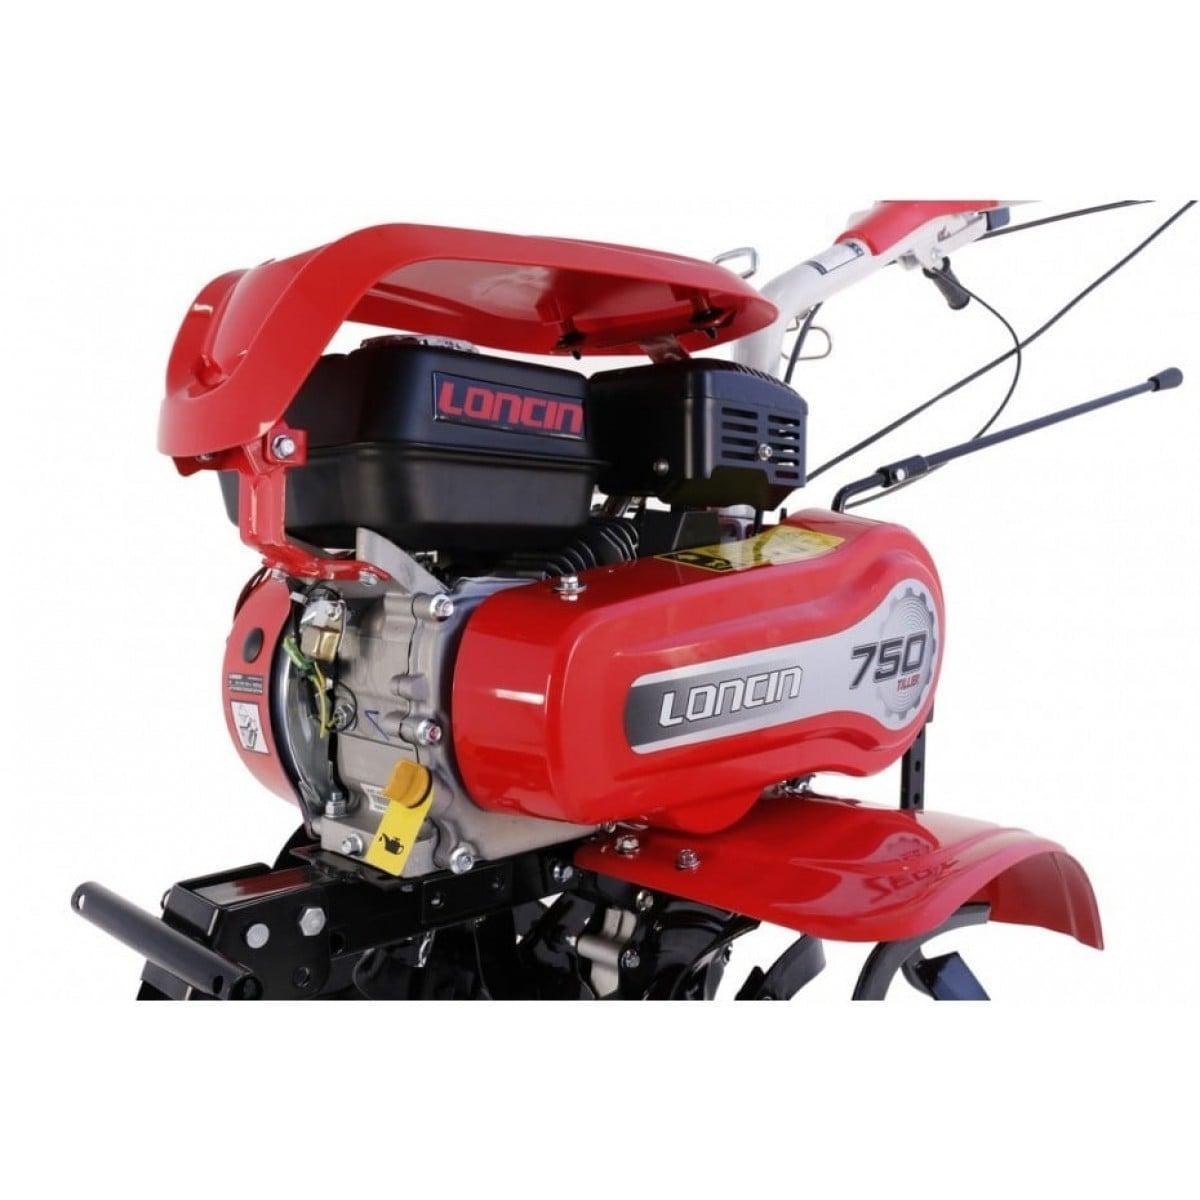 motocultor loncin lc750 7cp o mac.ro 2 2 37